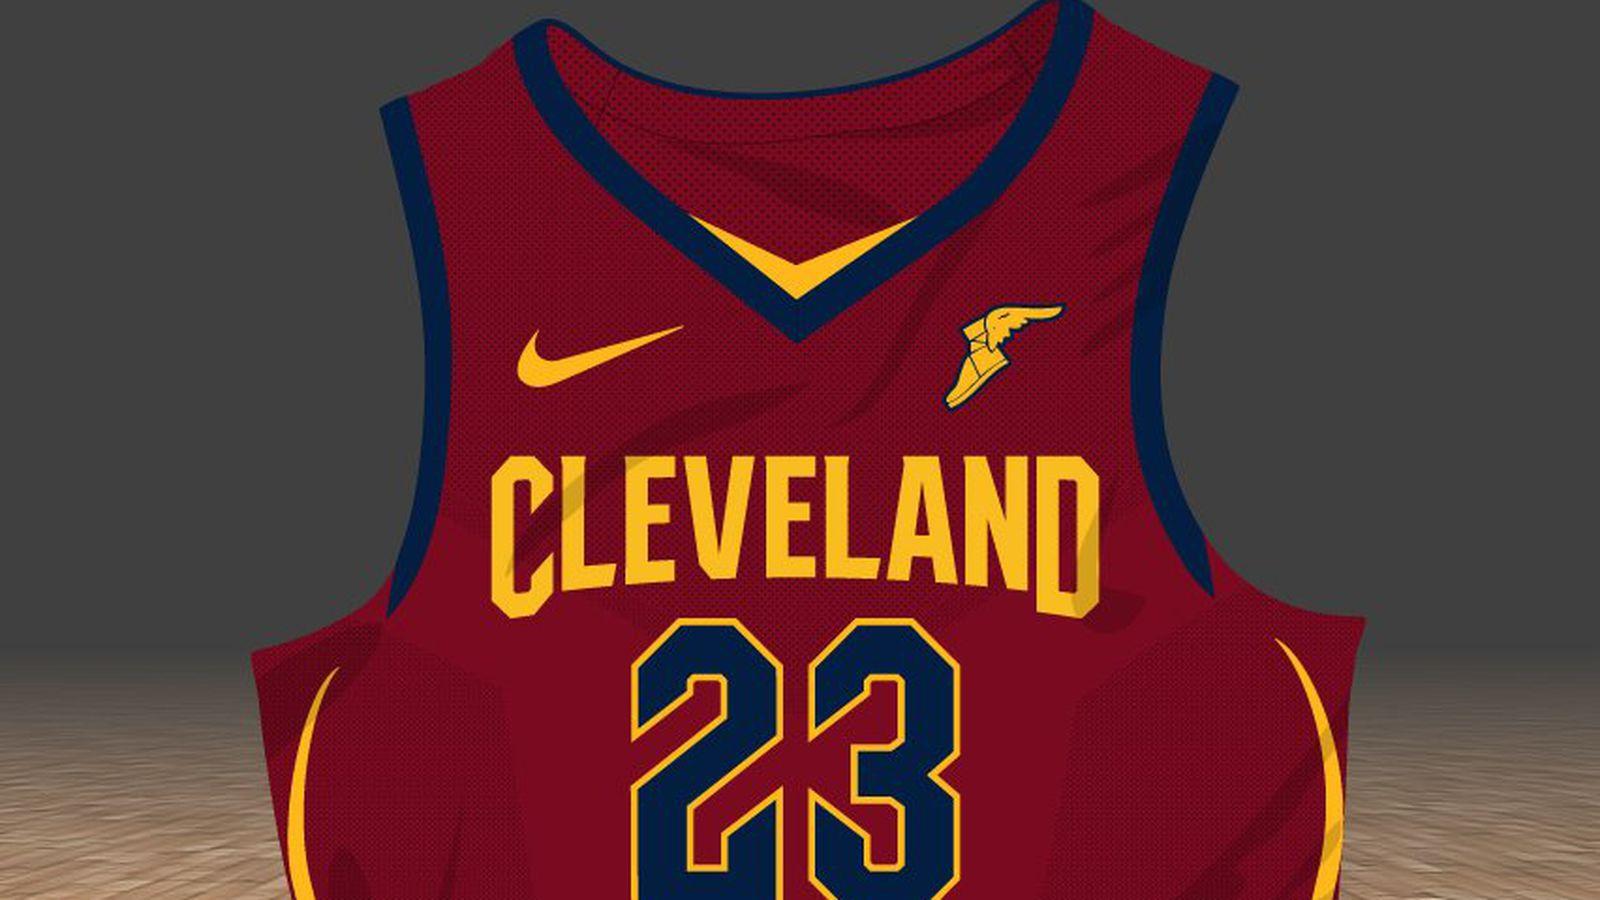 Cavs Uniforms 2018